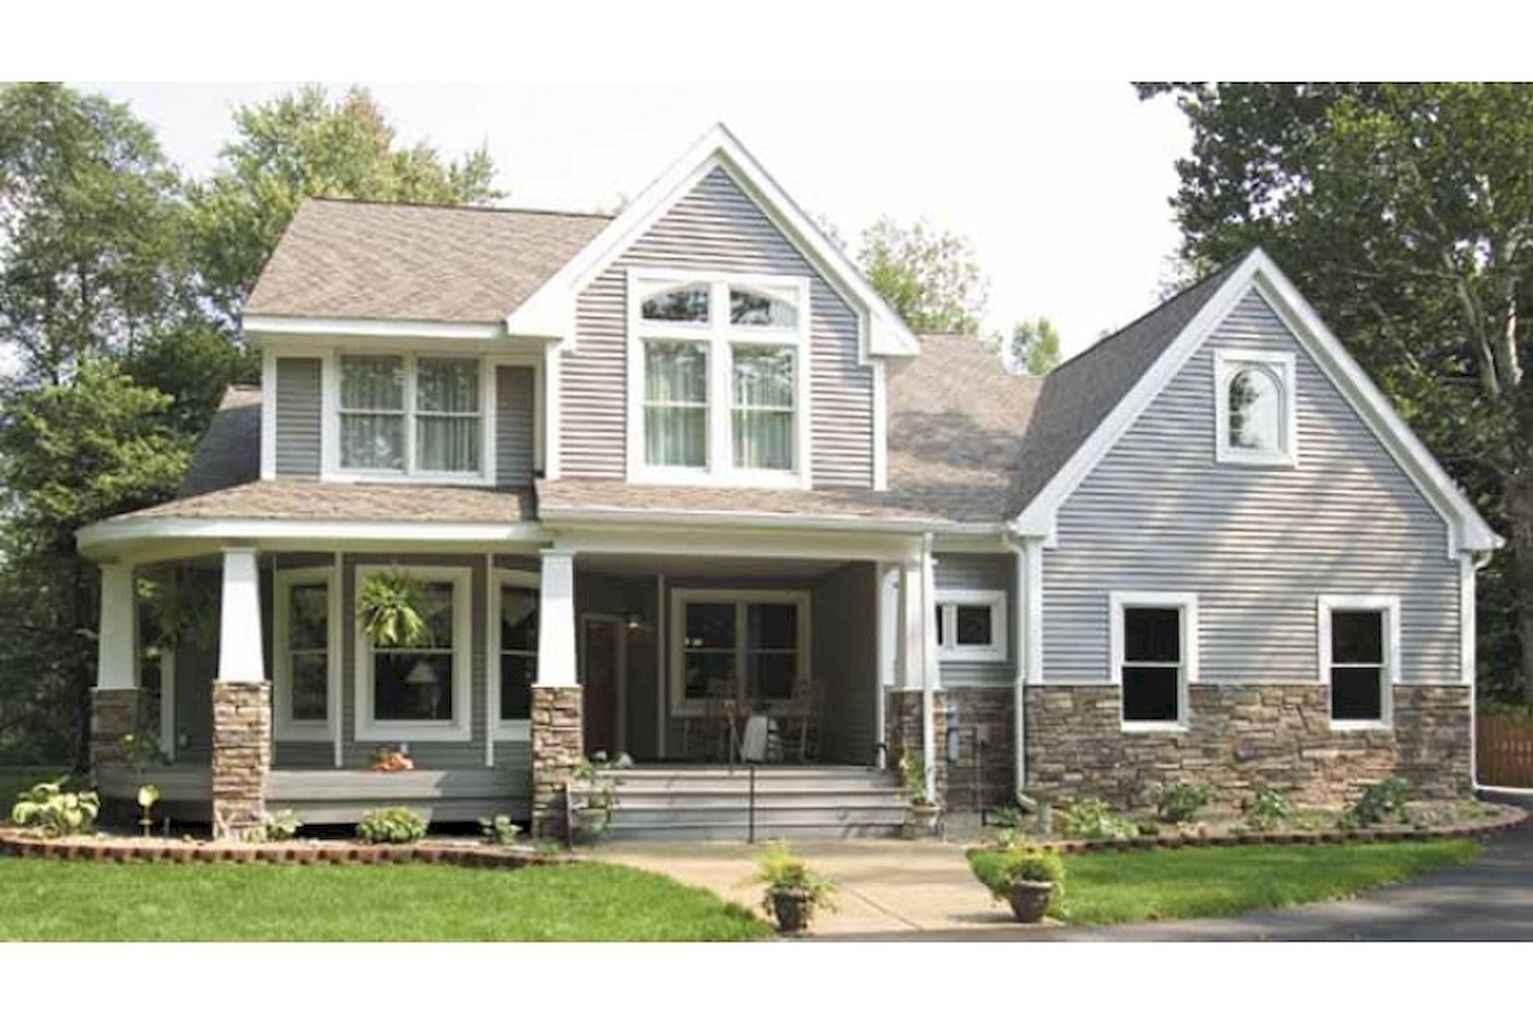 60 amazing farmhouse plans cracker style design ideas (16)